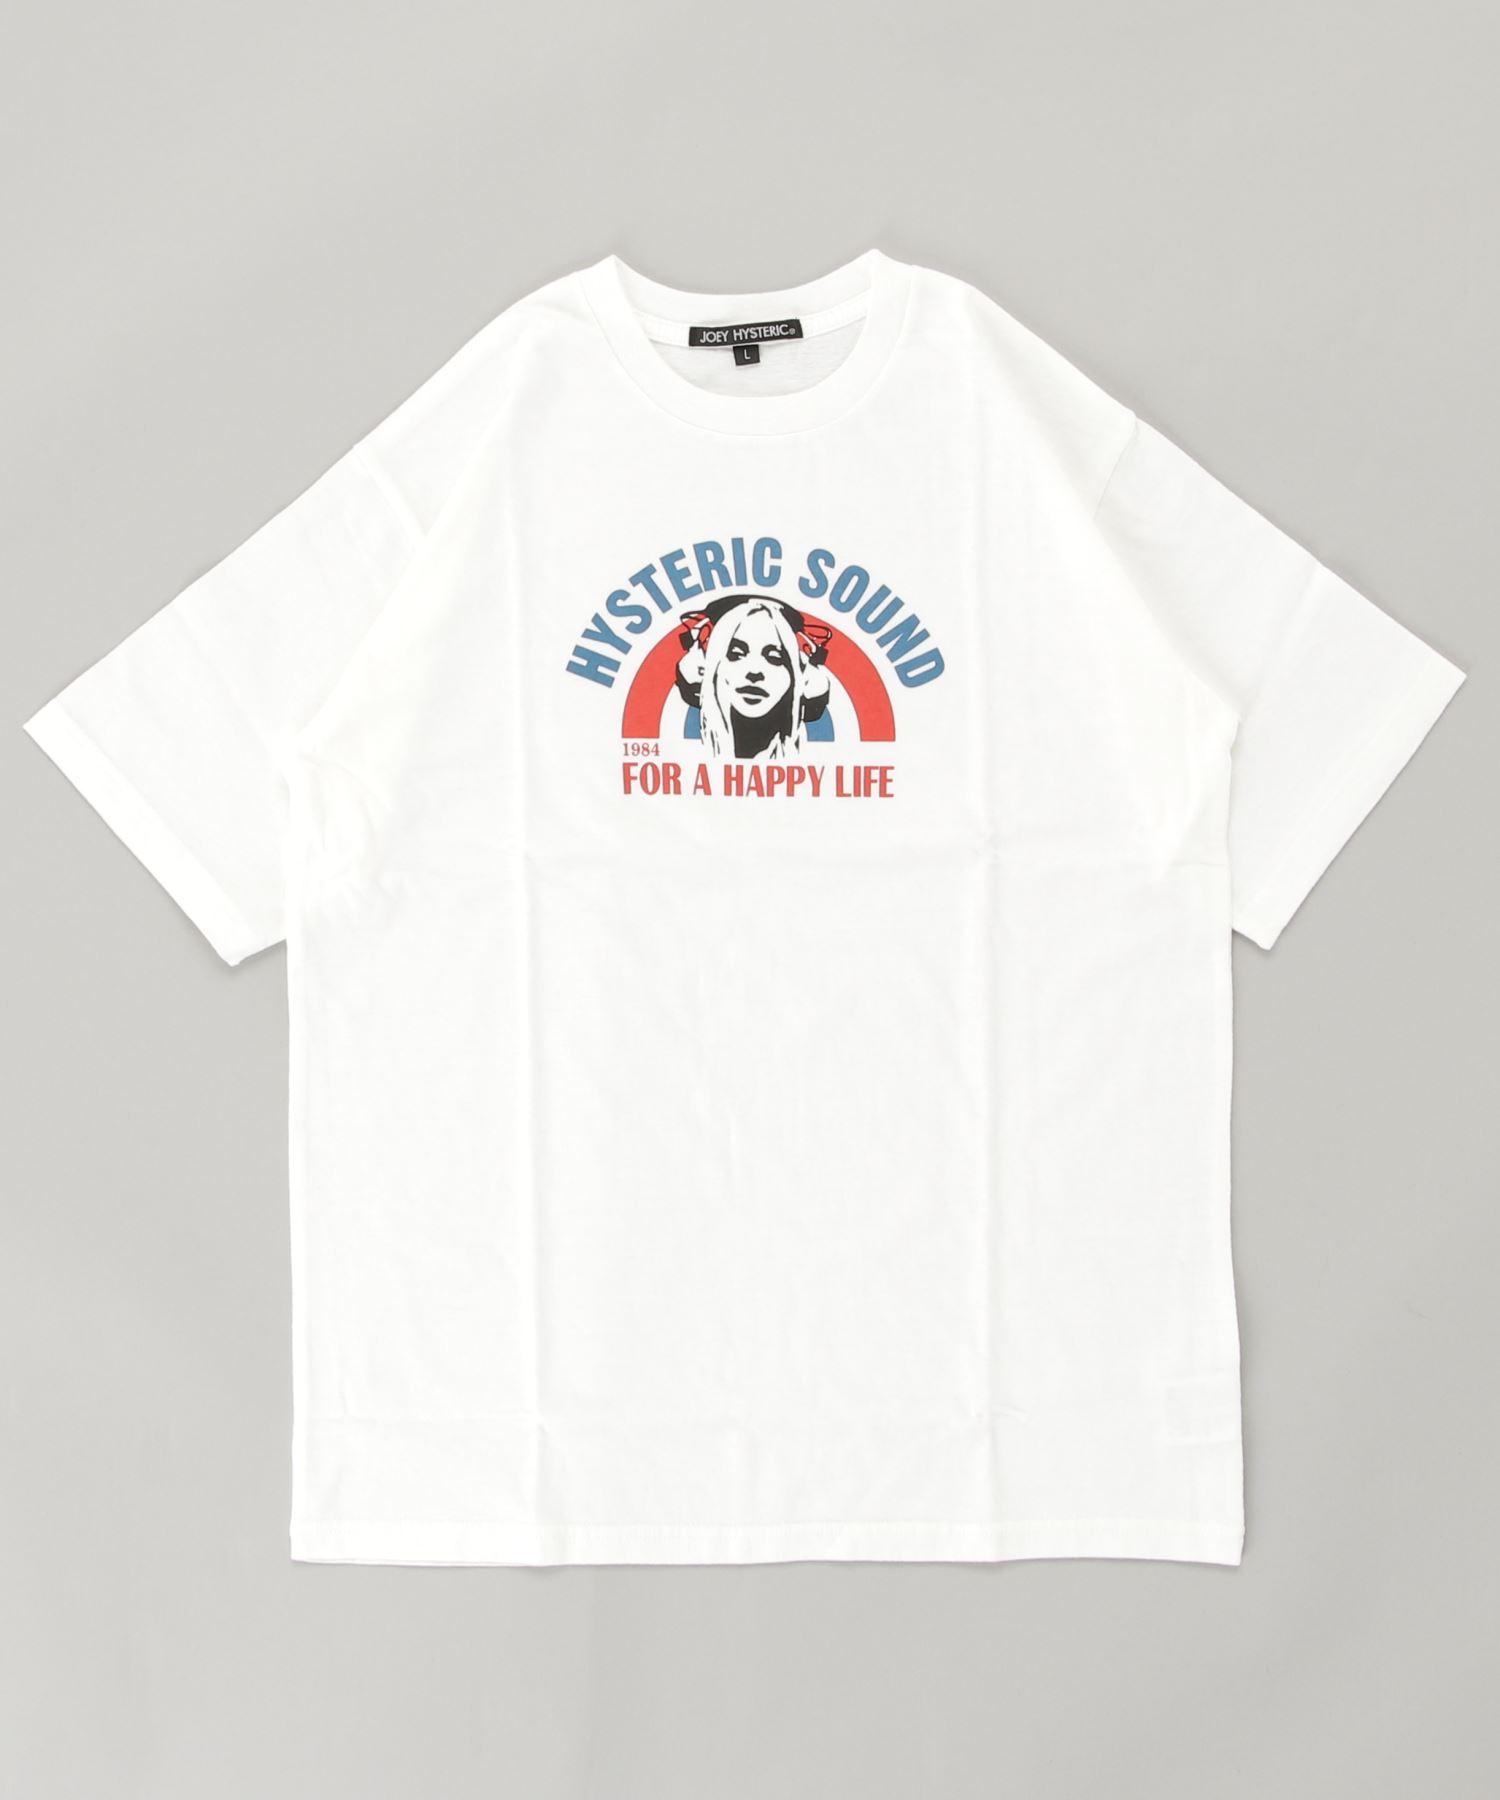 FOR HAPPY LIFE オーバーサイズTシャツ【L】